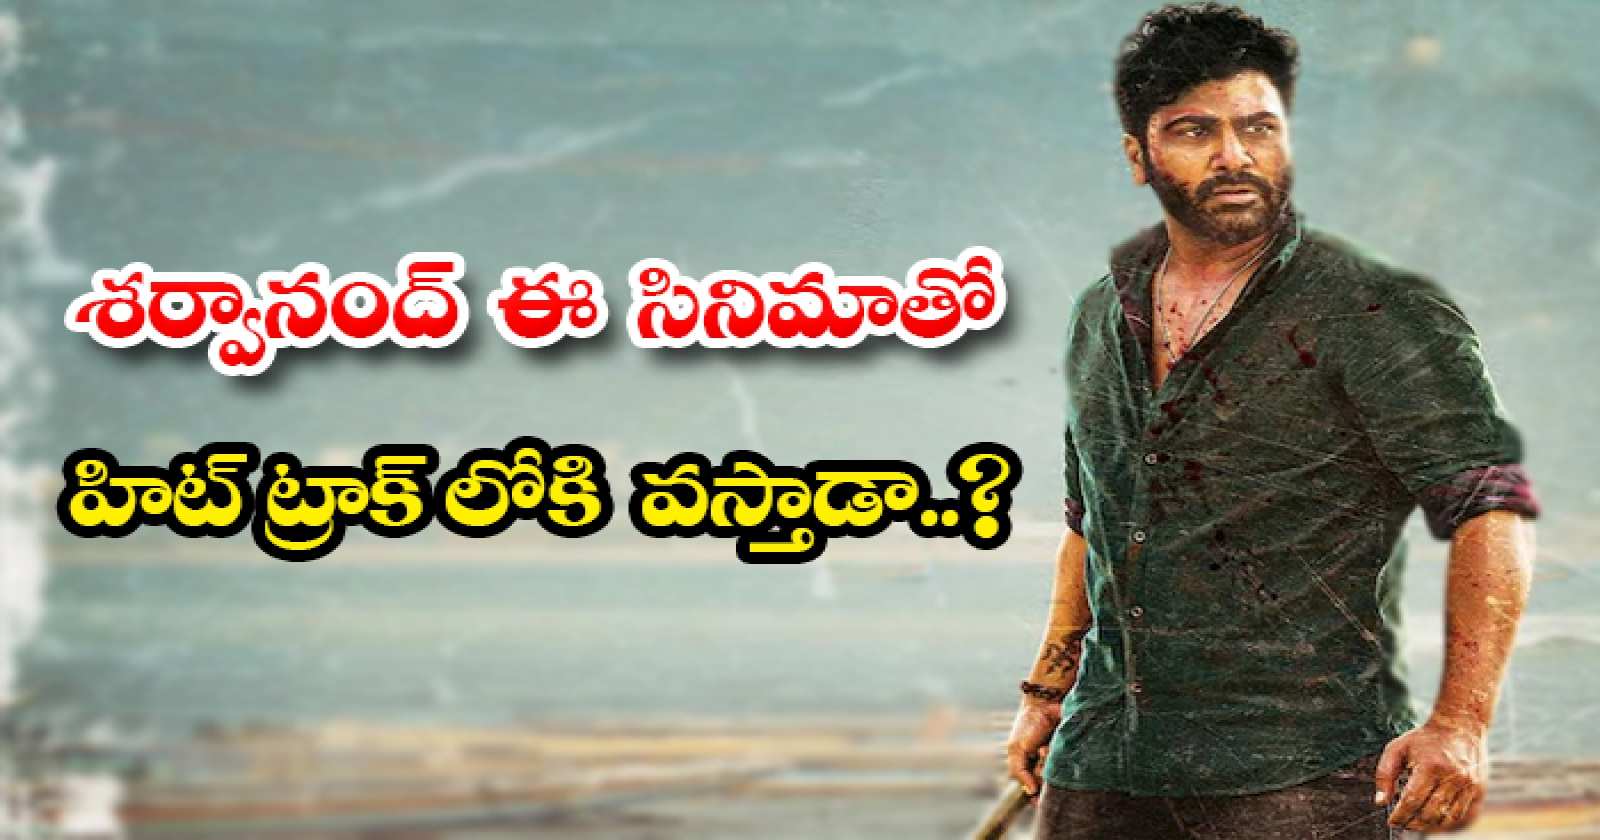 Will Sharwanand Get Hit Track On Mahasamudram Movie-శర్వానంద్ ఈ సినిమాతో హిట్ ట్రాక్ లోకి వస్తాడా..-Latest News - Telugu-Telugu Tollywood Photo Image-TeluguStop.com